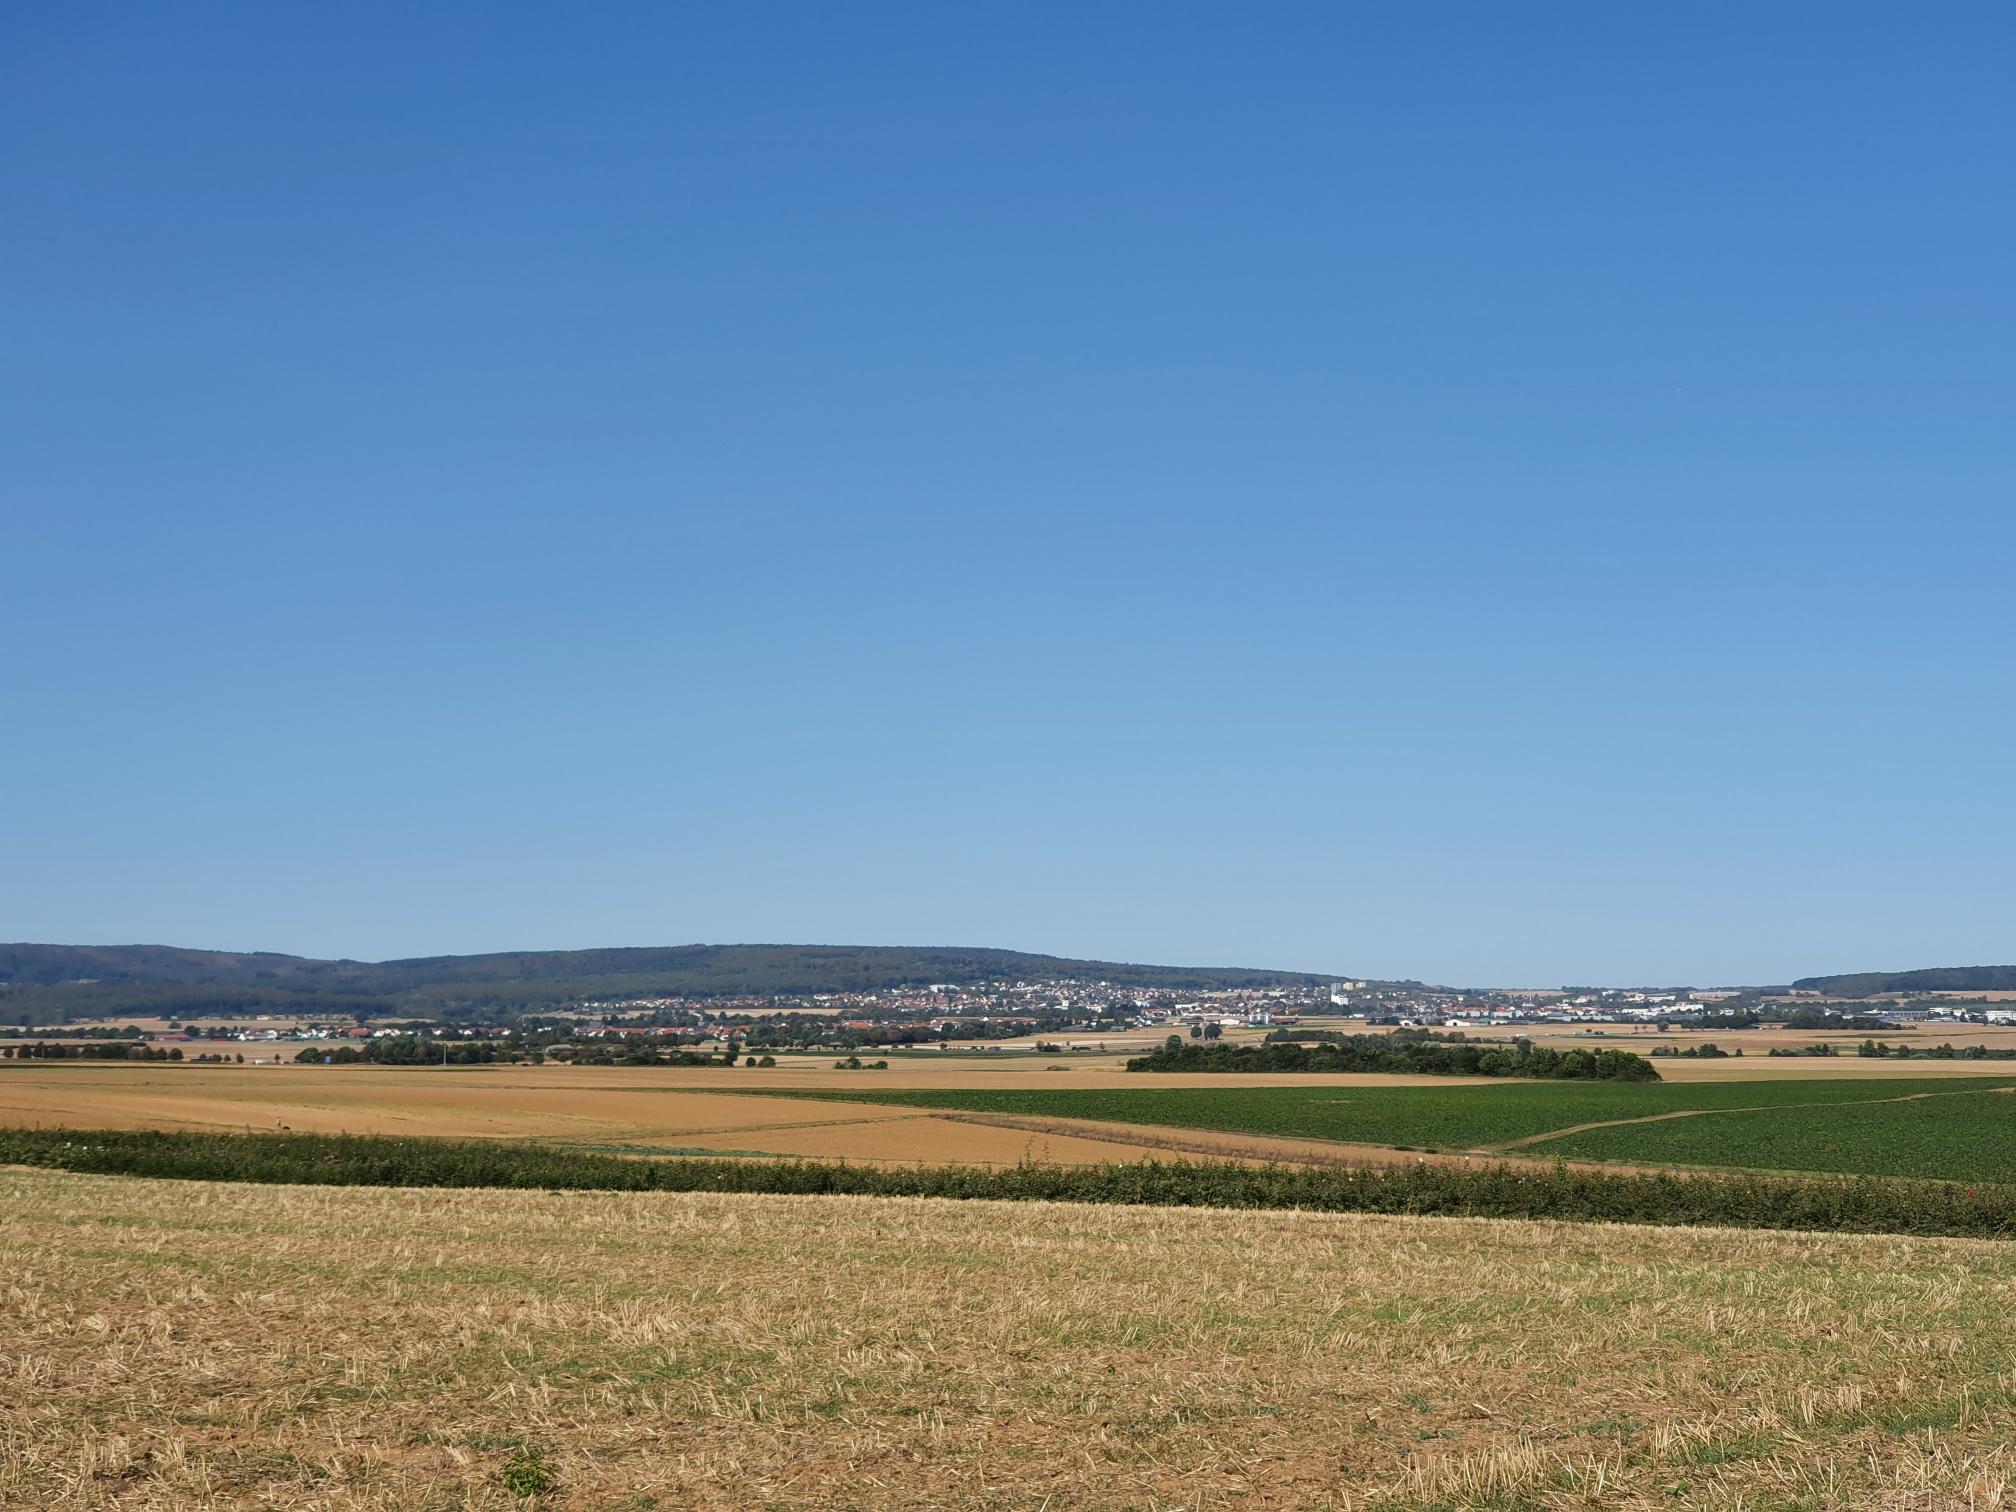 Stfeinfurth Blick Nieder Weidel/Butzbach